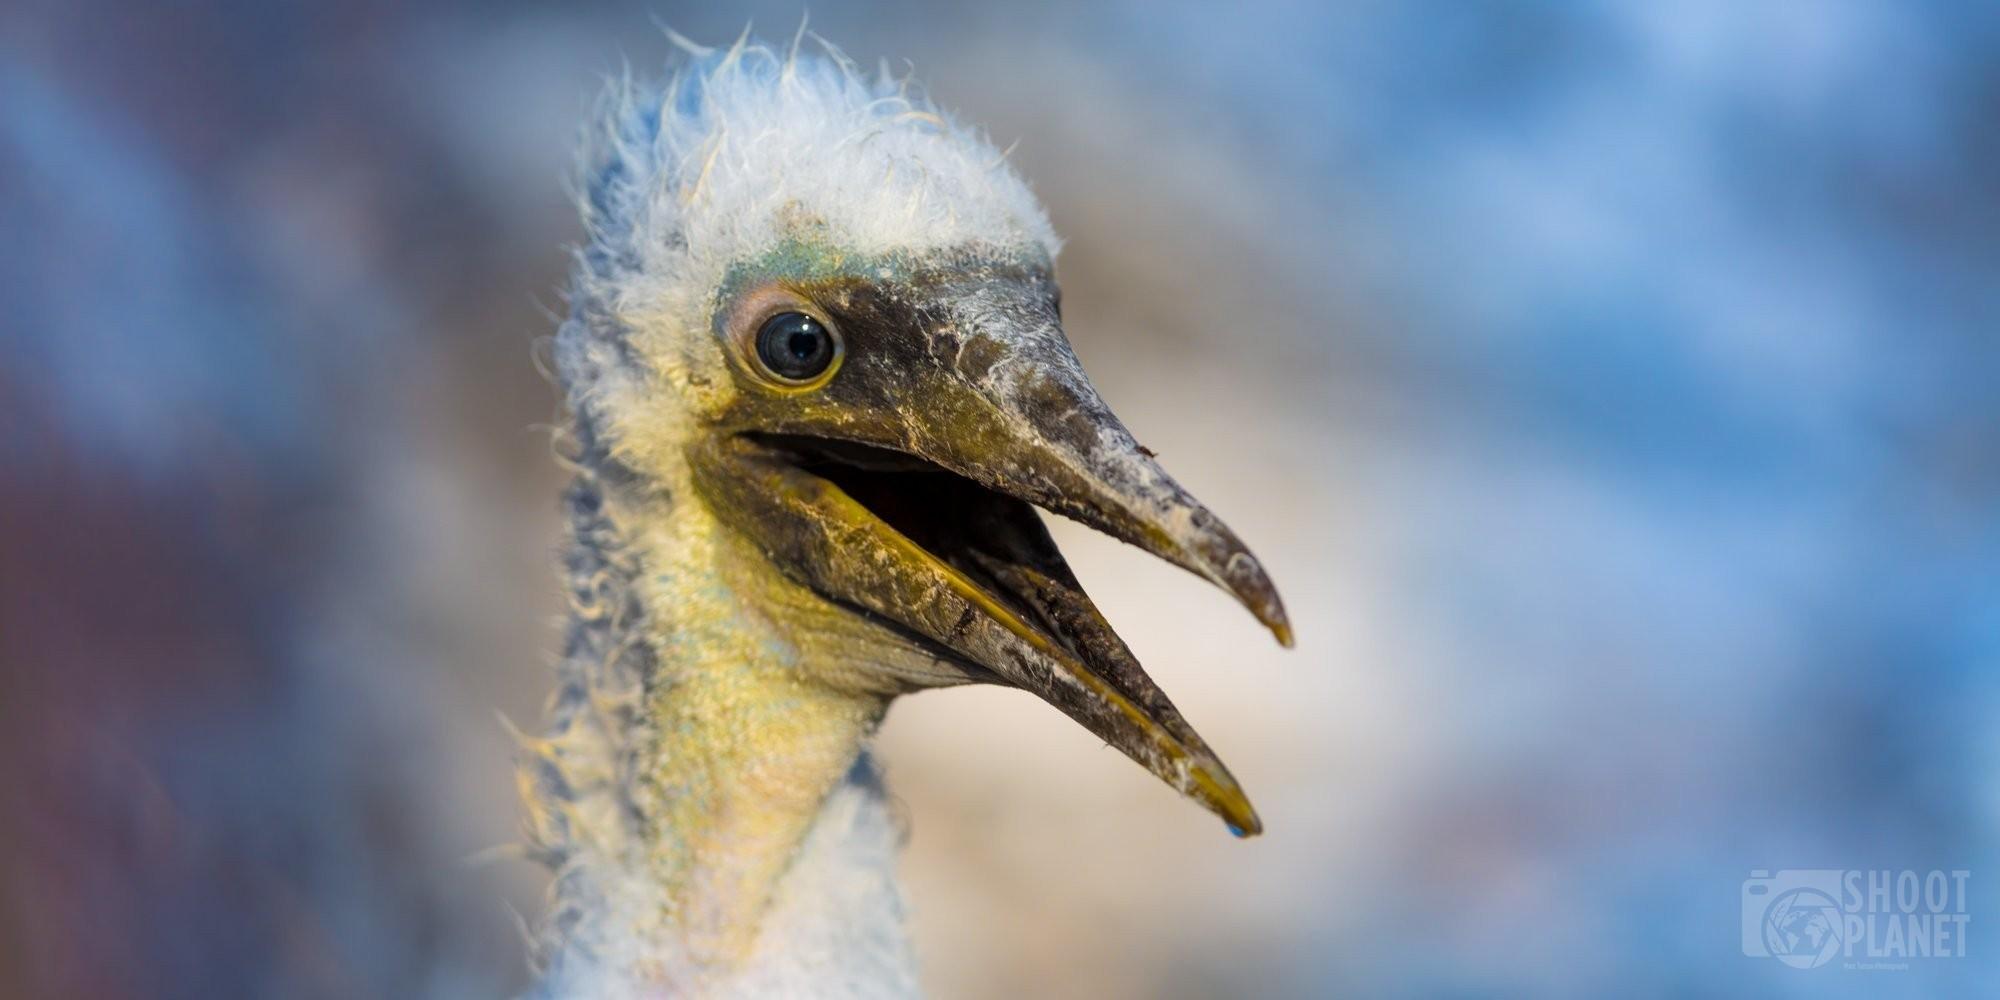 Waved albatross chick portrait in Galapagos Ecuador